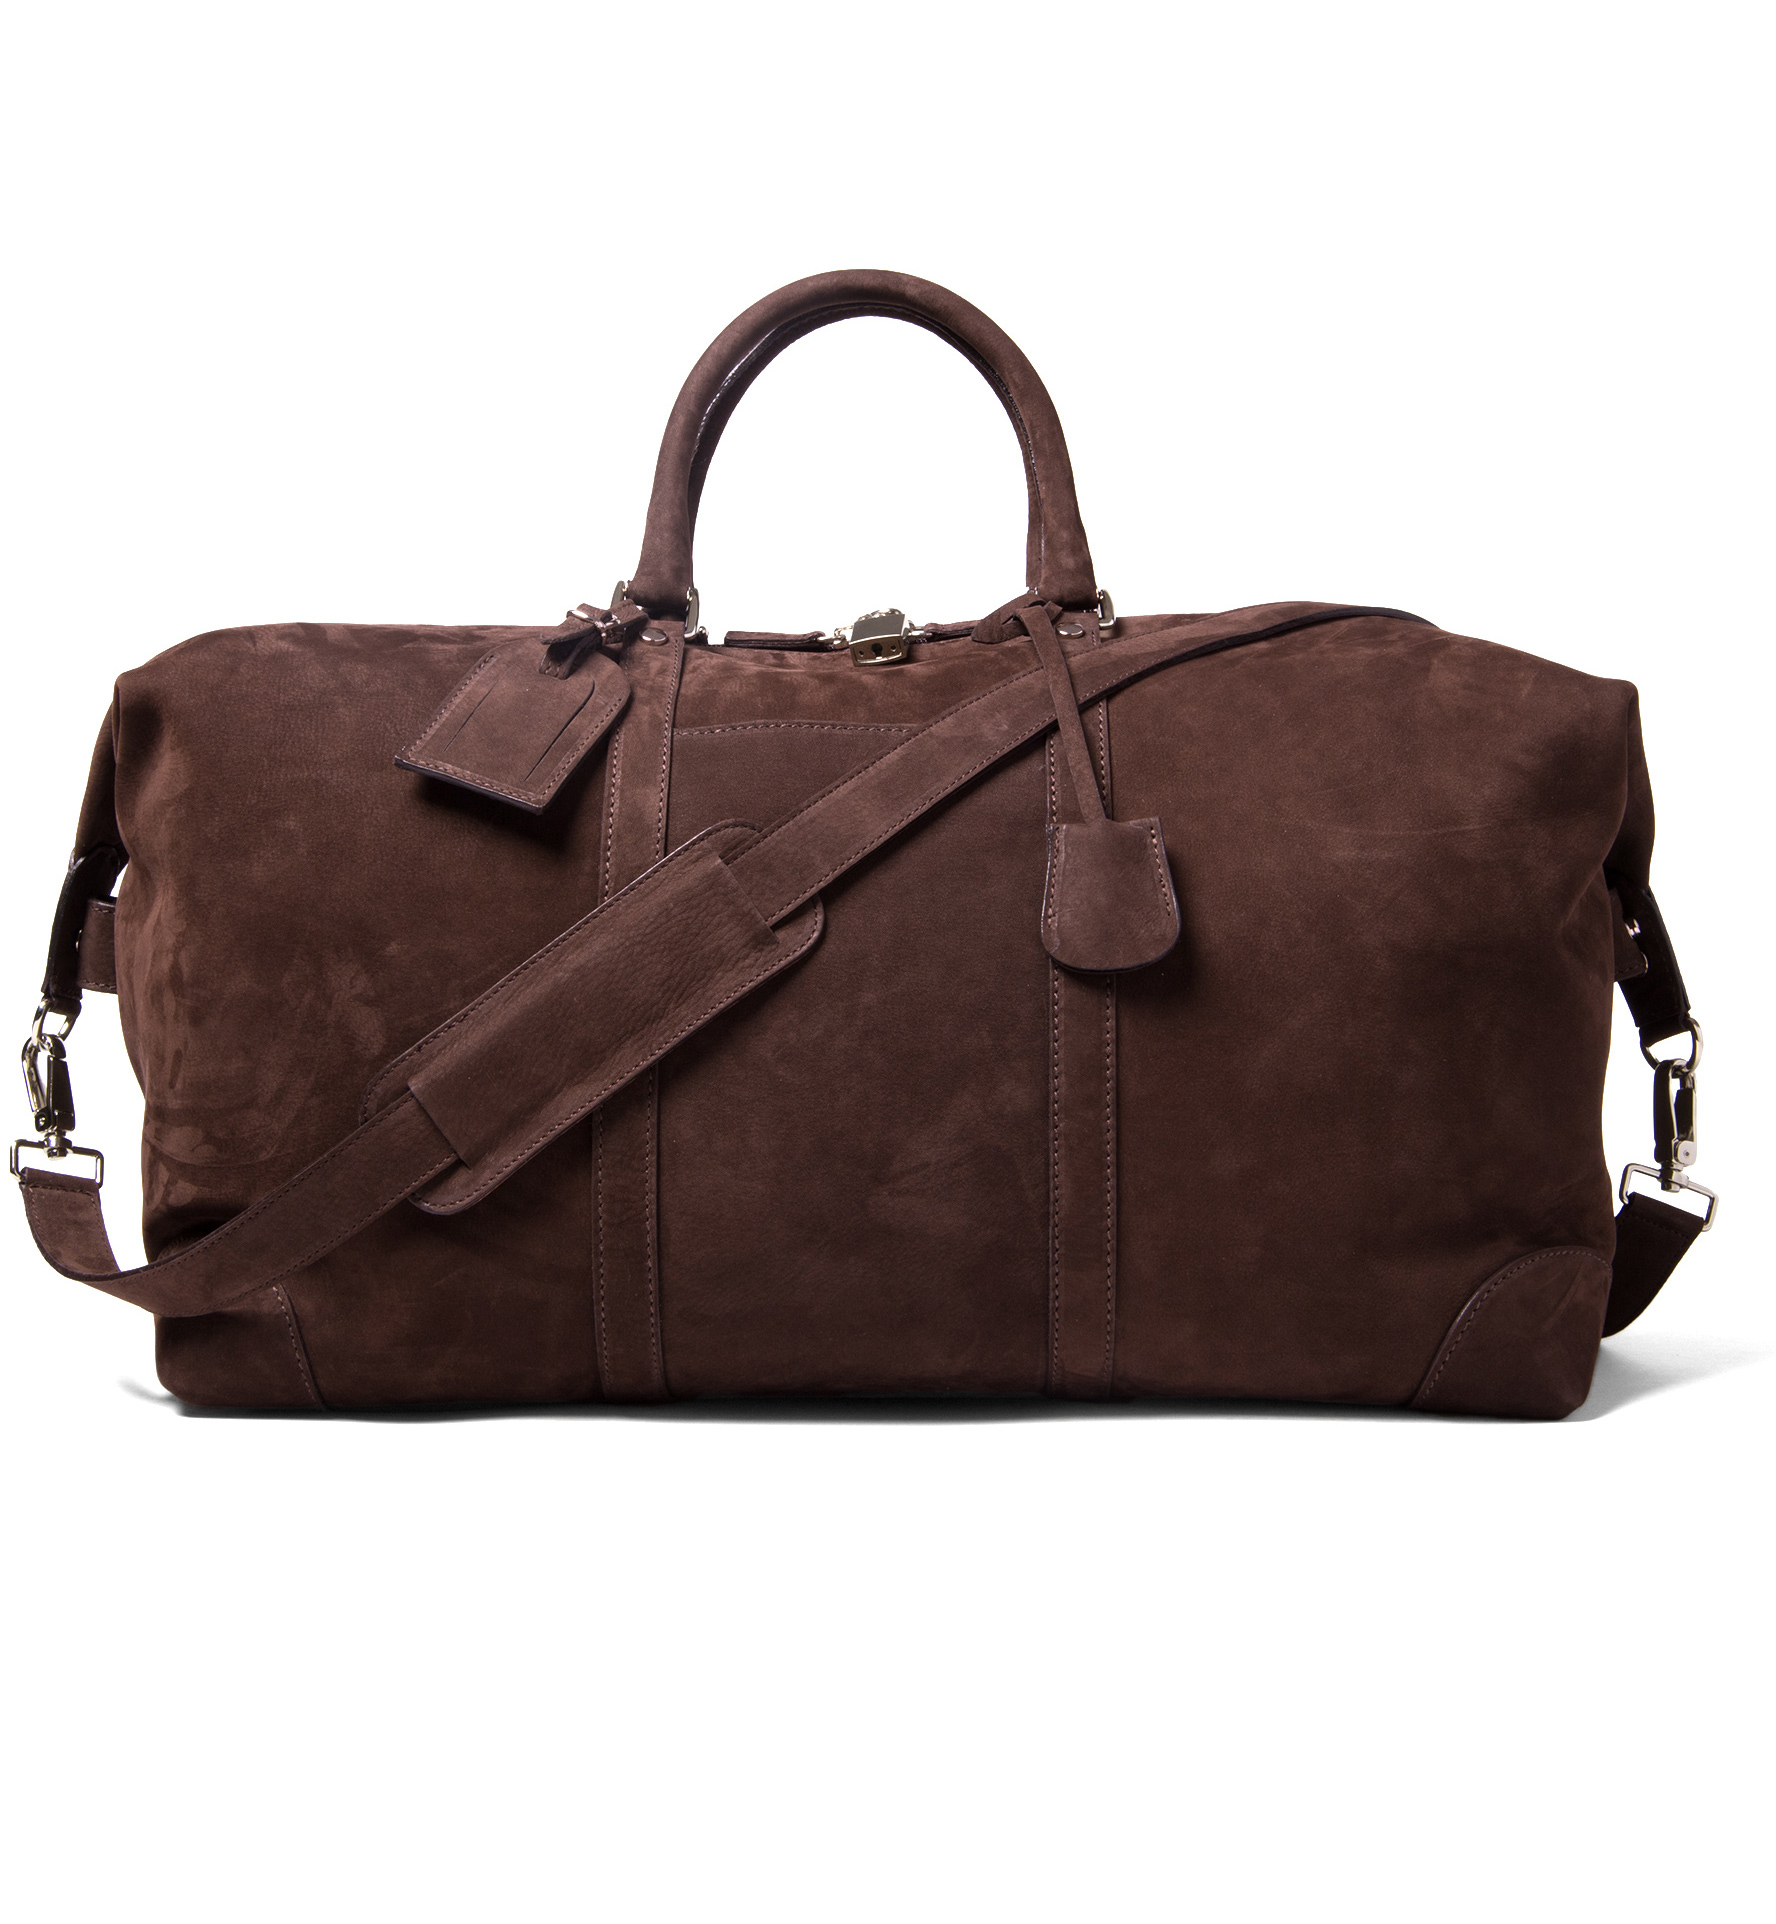 Zoom Image of Italian Brown Nubuck Duffle Bag